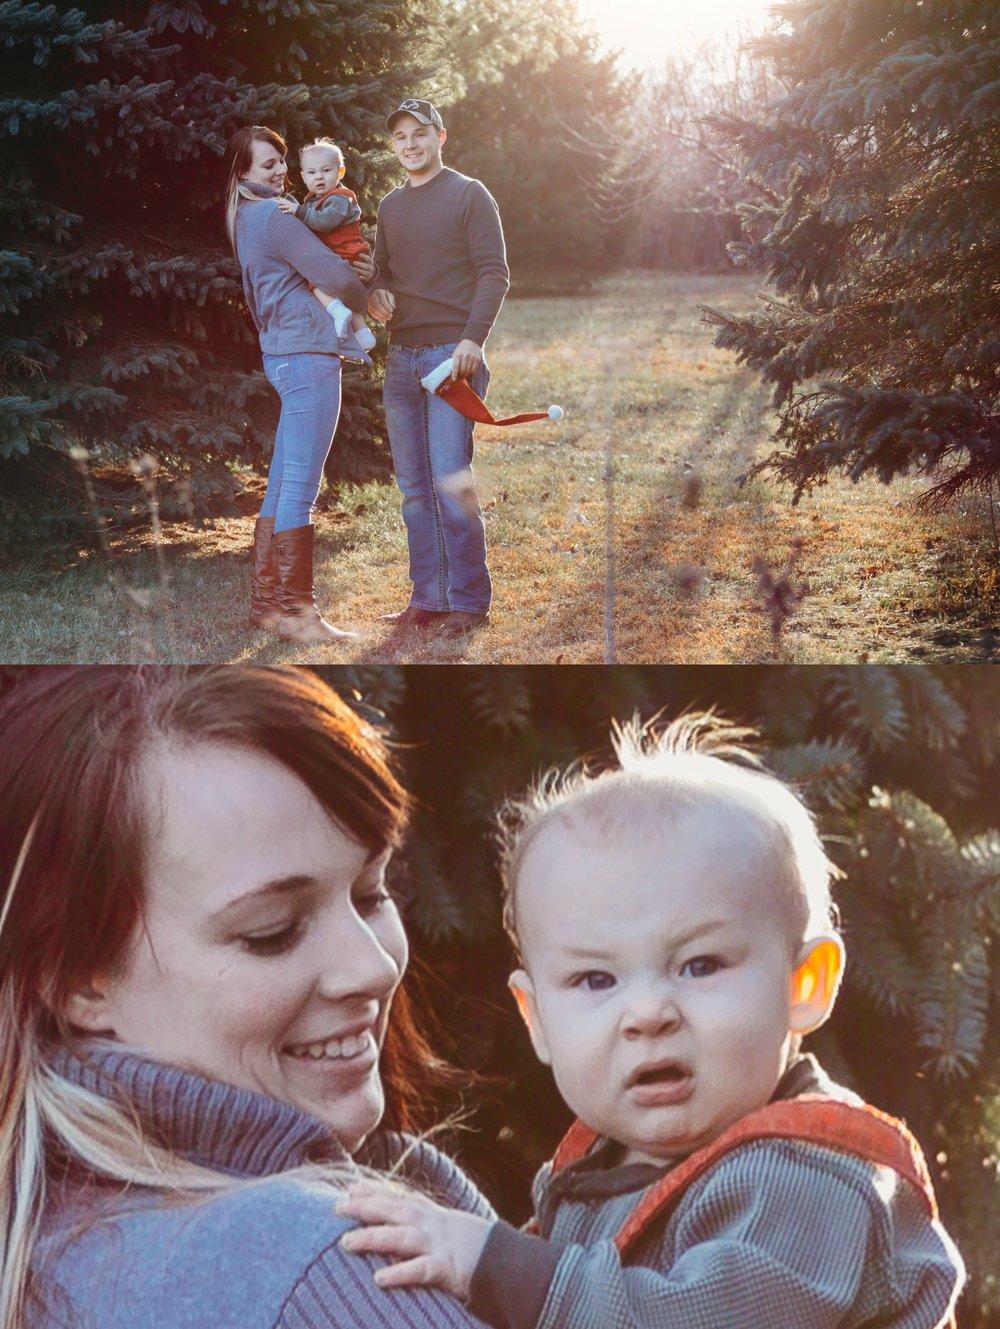 Rowan Christmas made beloved photography eastern iowa photographer family cedadr falls.jpg